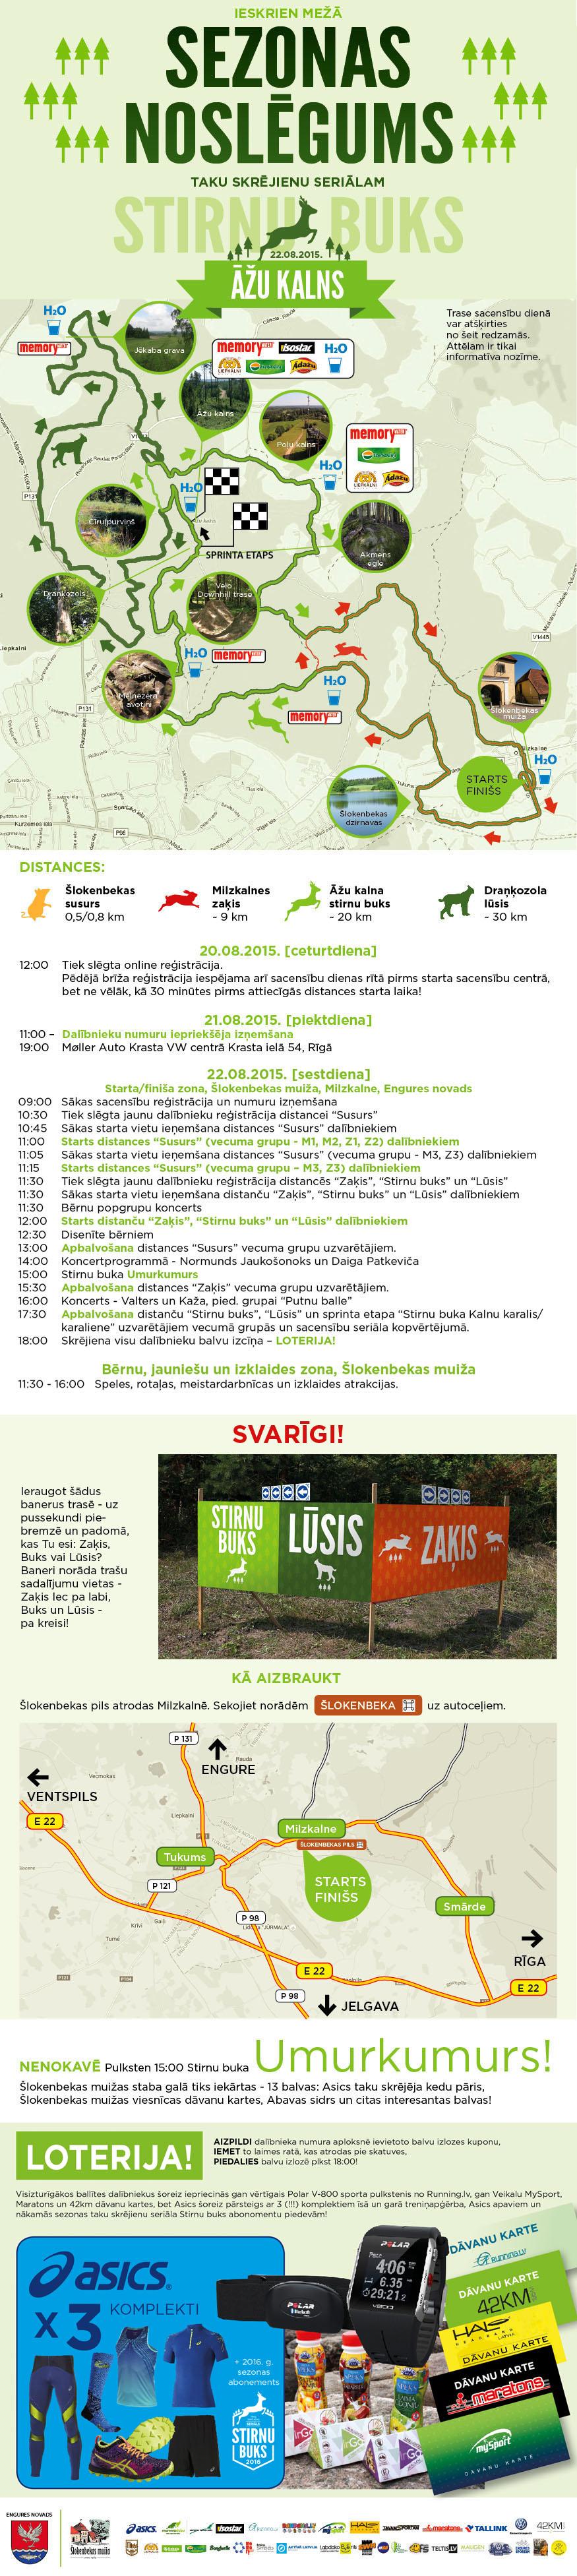 info_AZU3